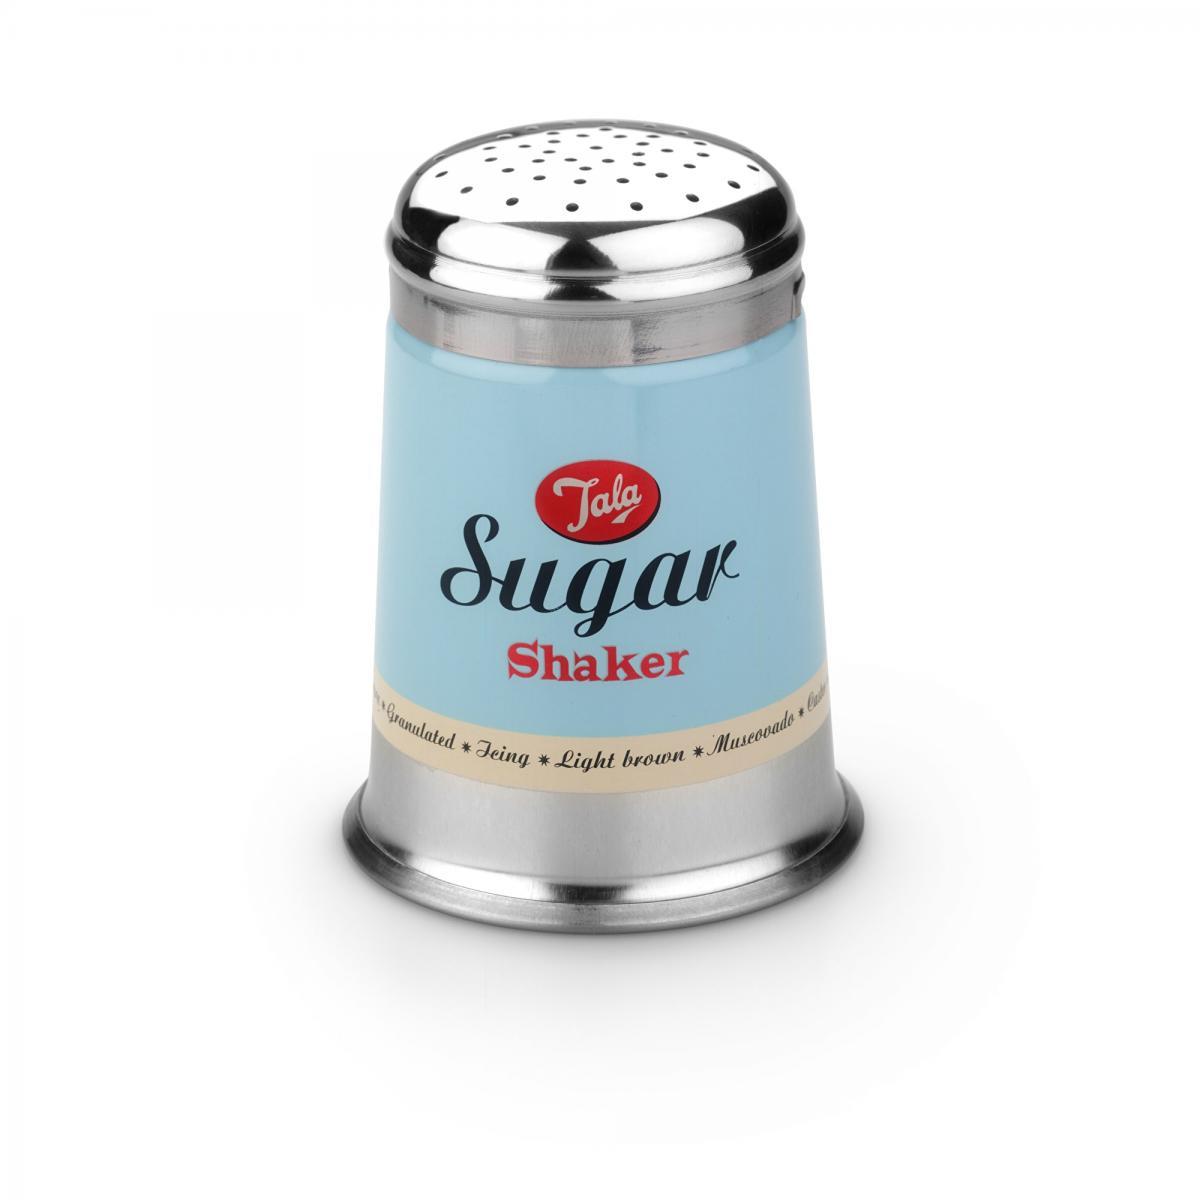 Originals 1960s Blue Sugar Shaker – Now Only £4.00